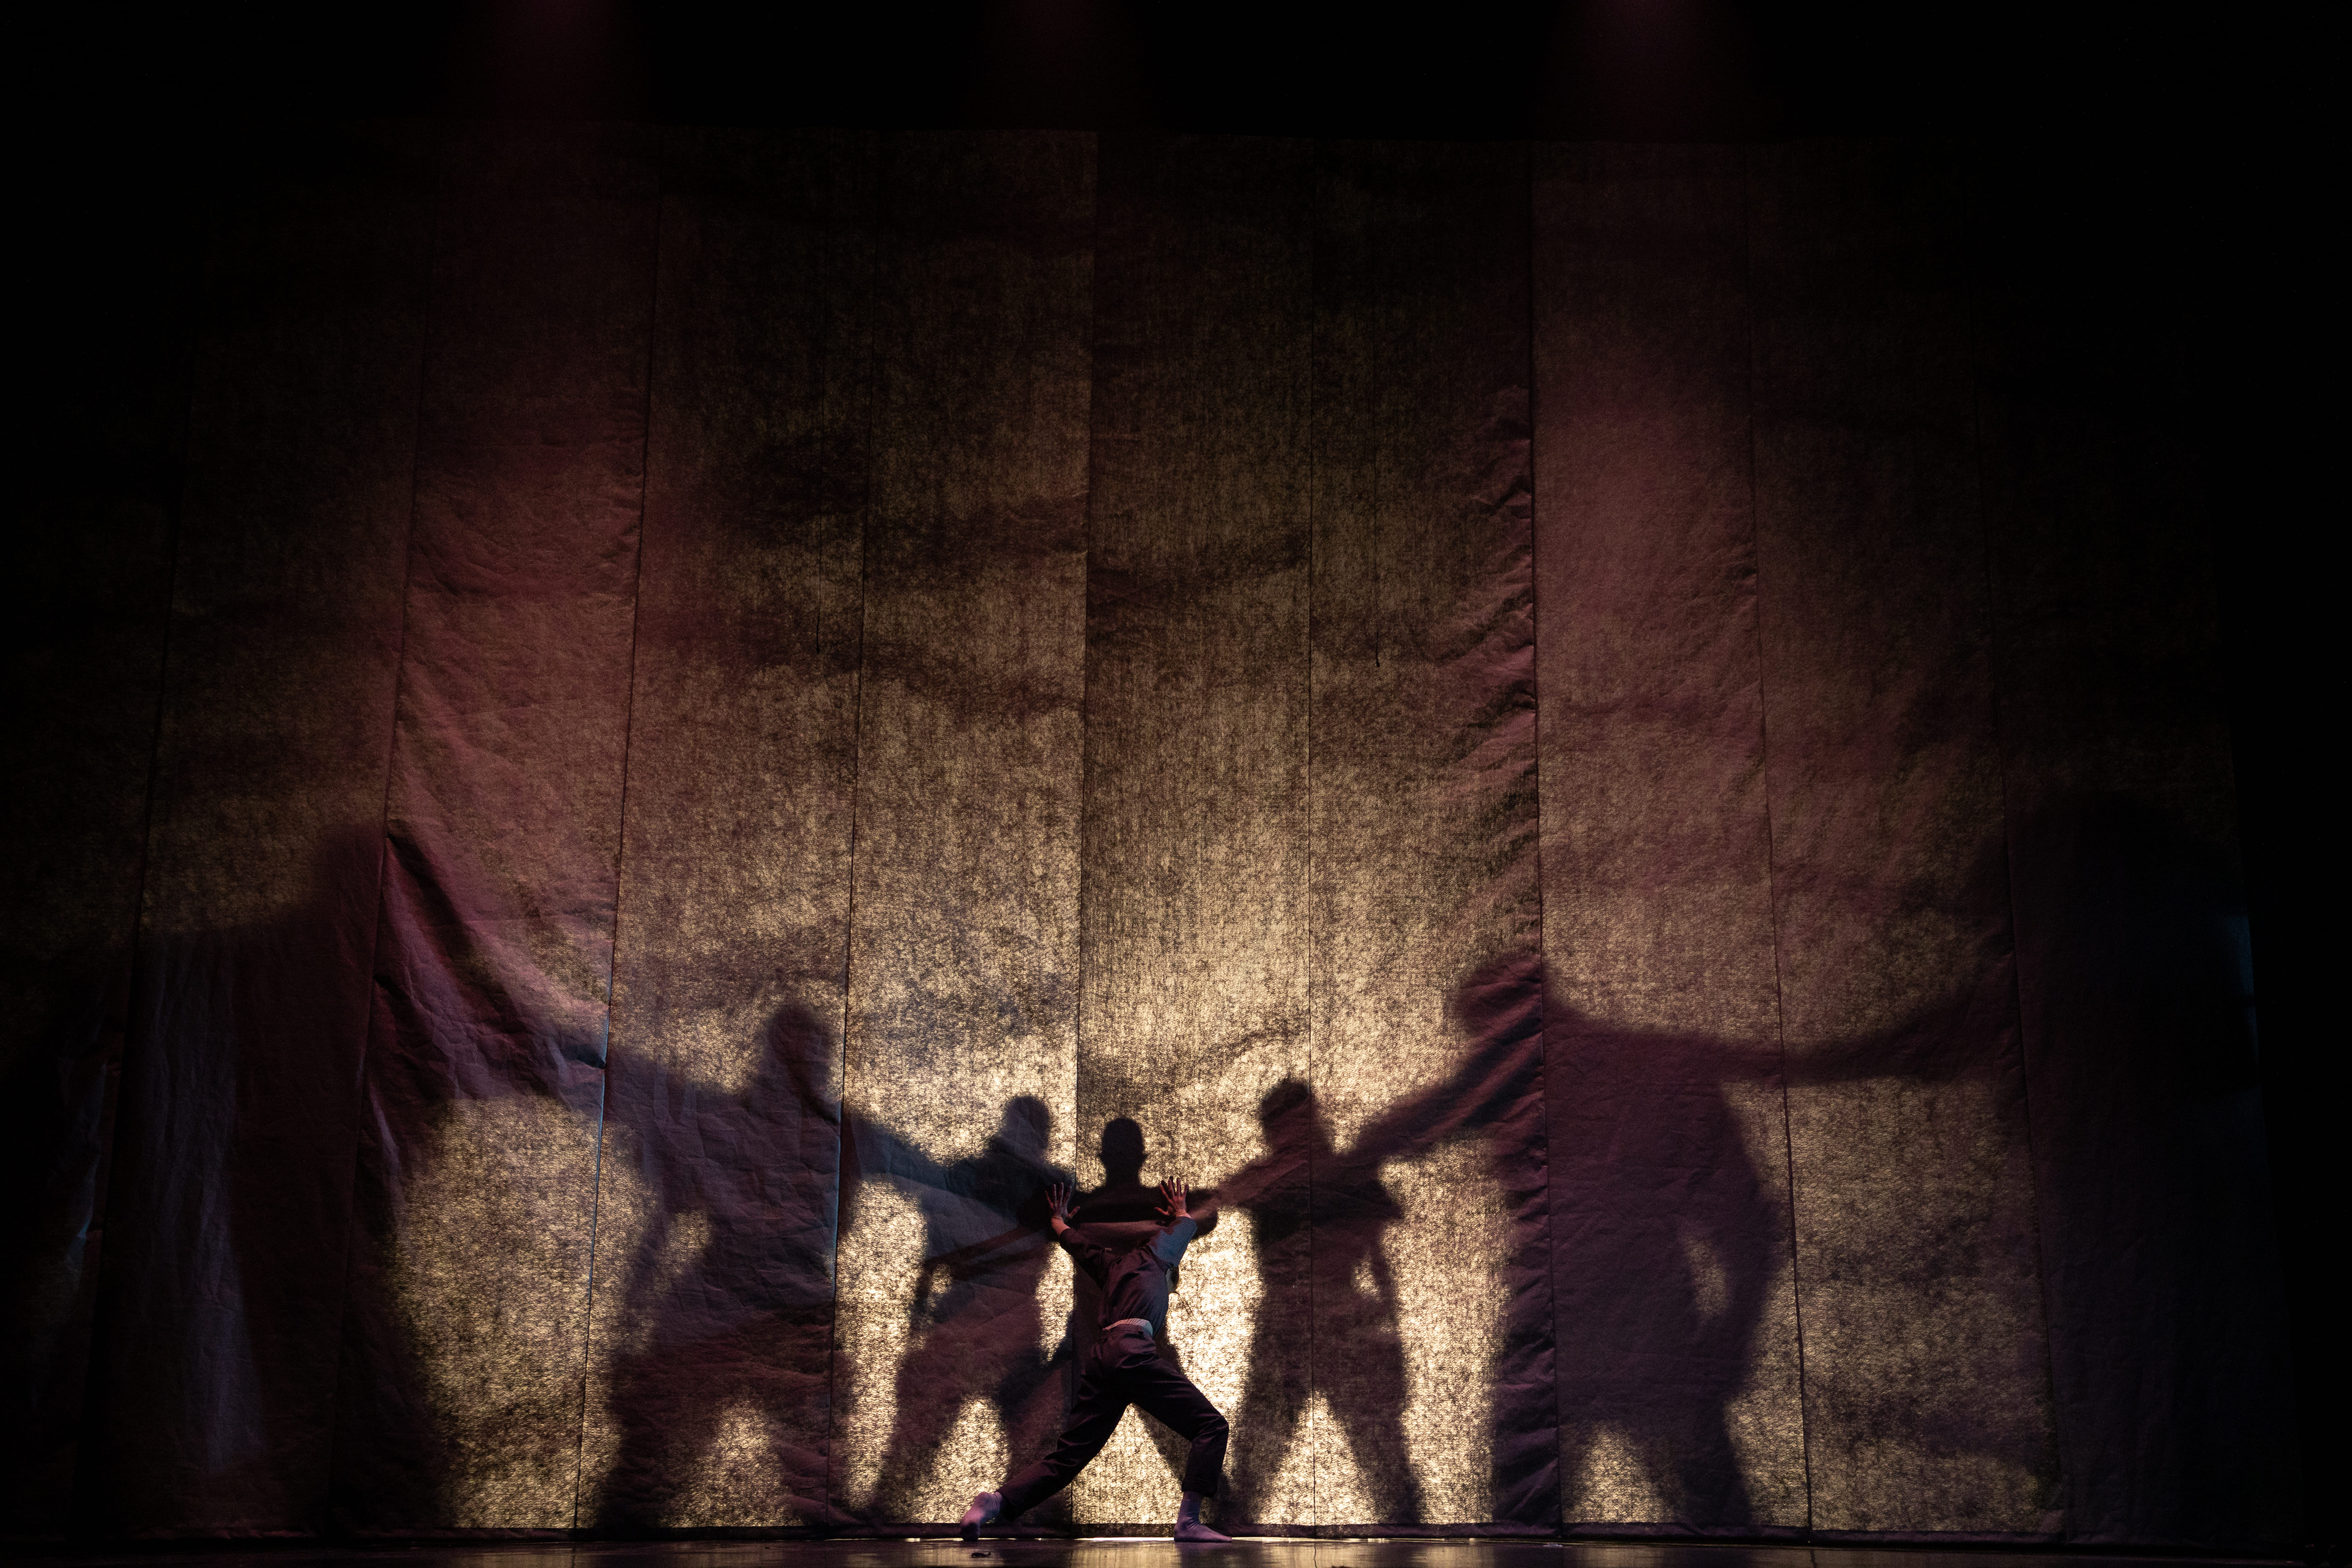 ТЕАТР Kyiv Modern Ballet. Ближе, чем любовь, 1984. Другая-2